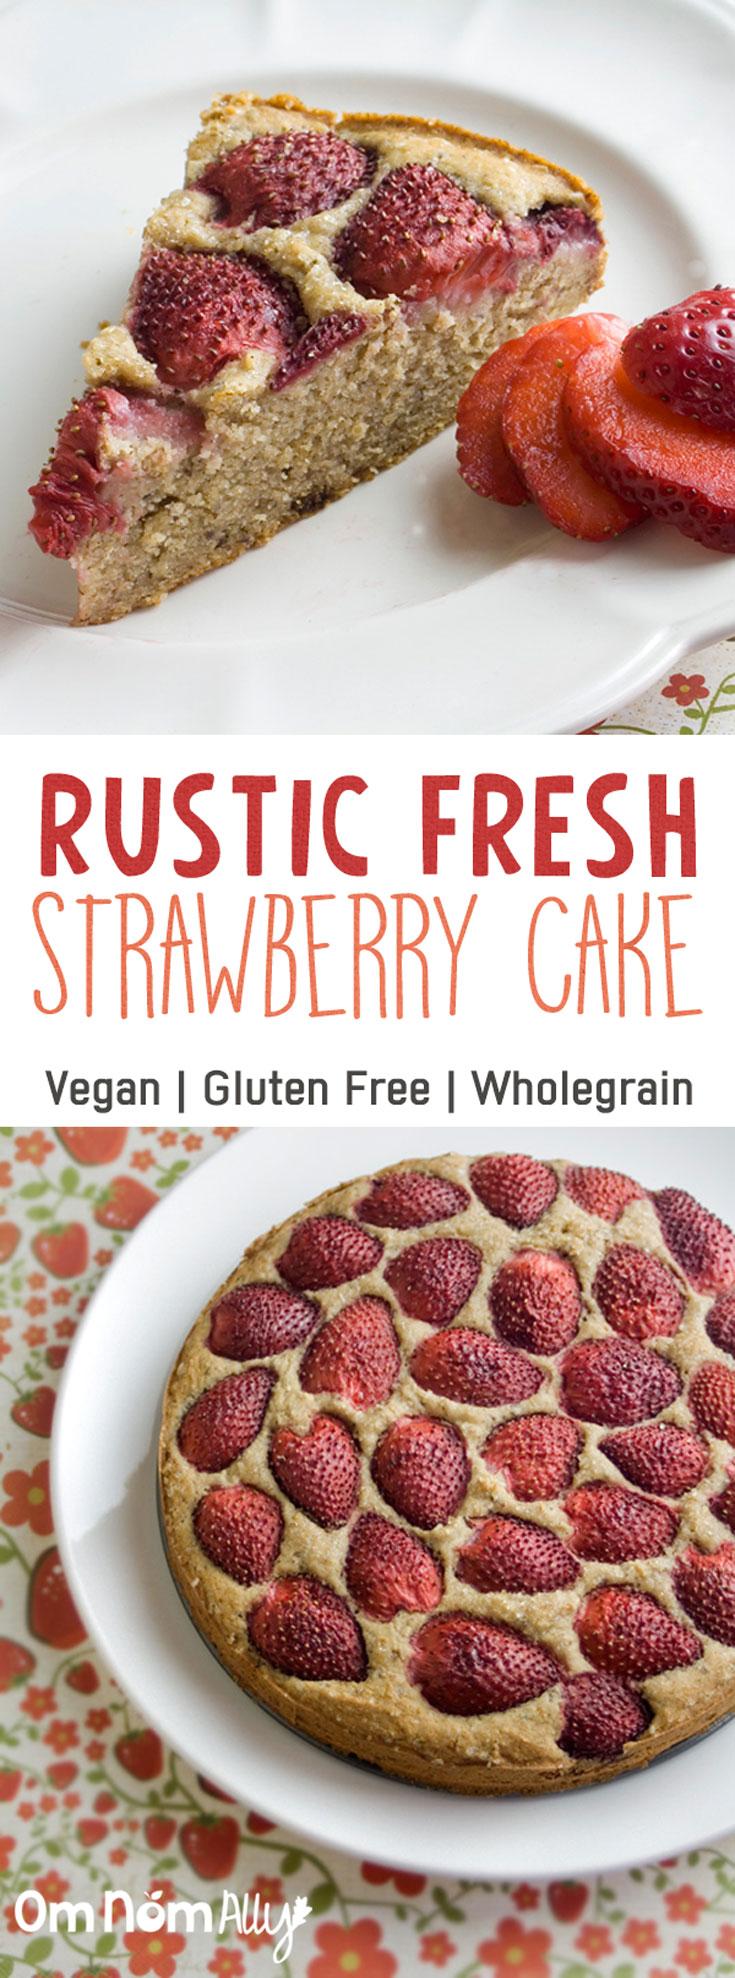 Rustic Fresh Strawberry Cake @OmNomAlly   Wholegrain, Gluten-free, Vegan